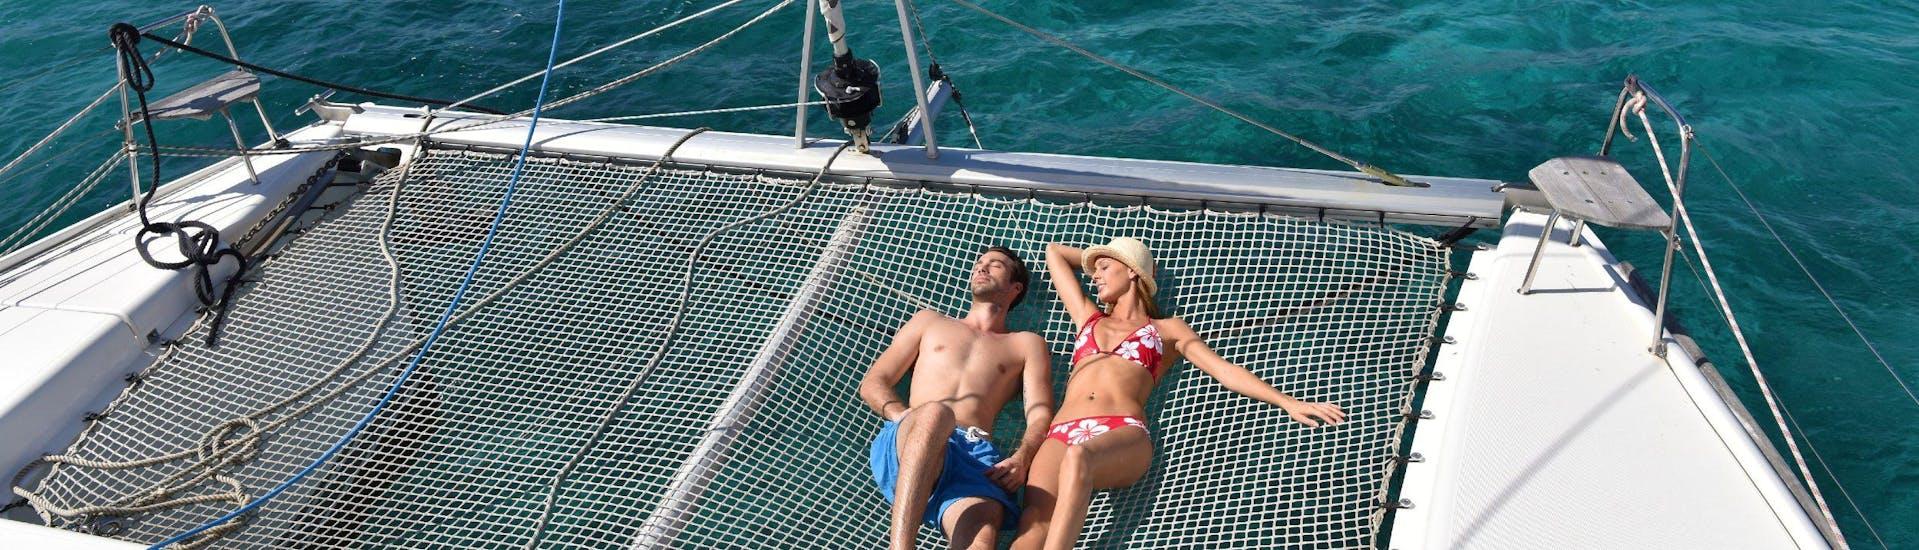 Un couple prend un bain de soleil sur un catamaran.